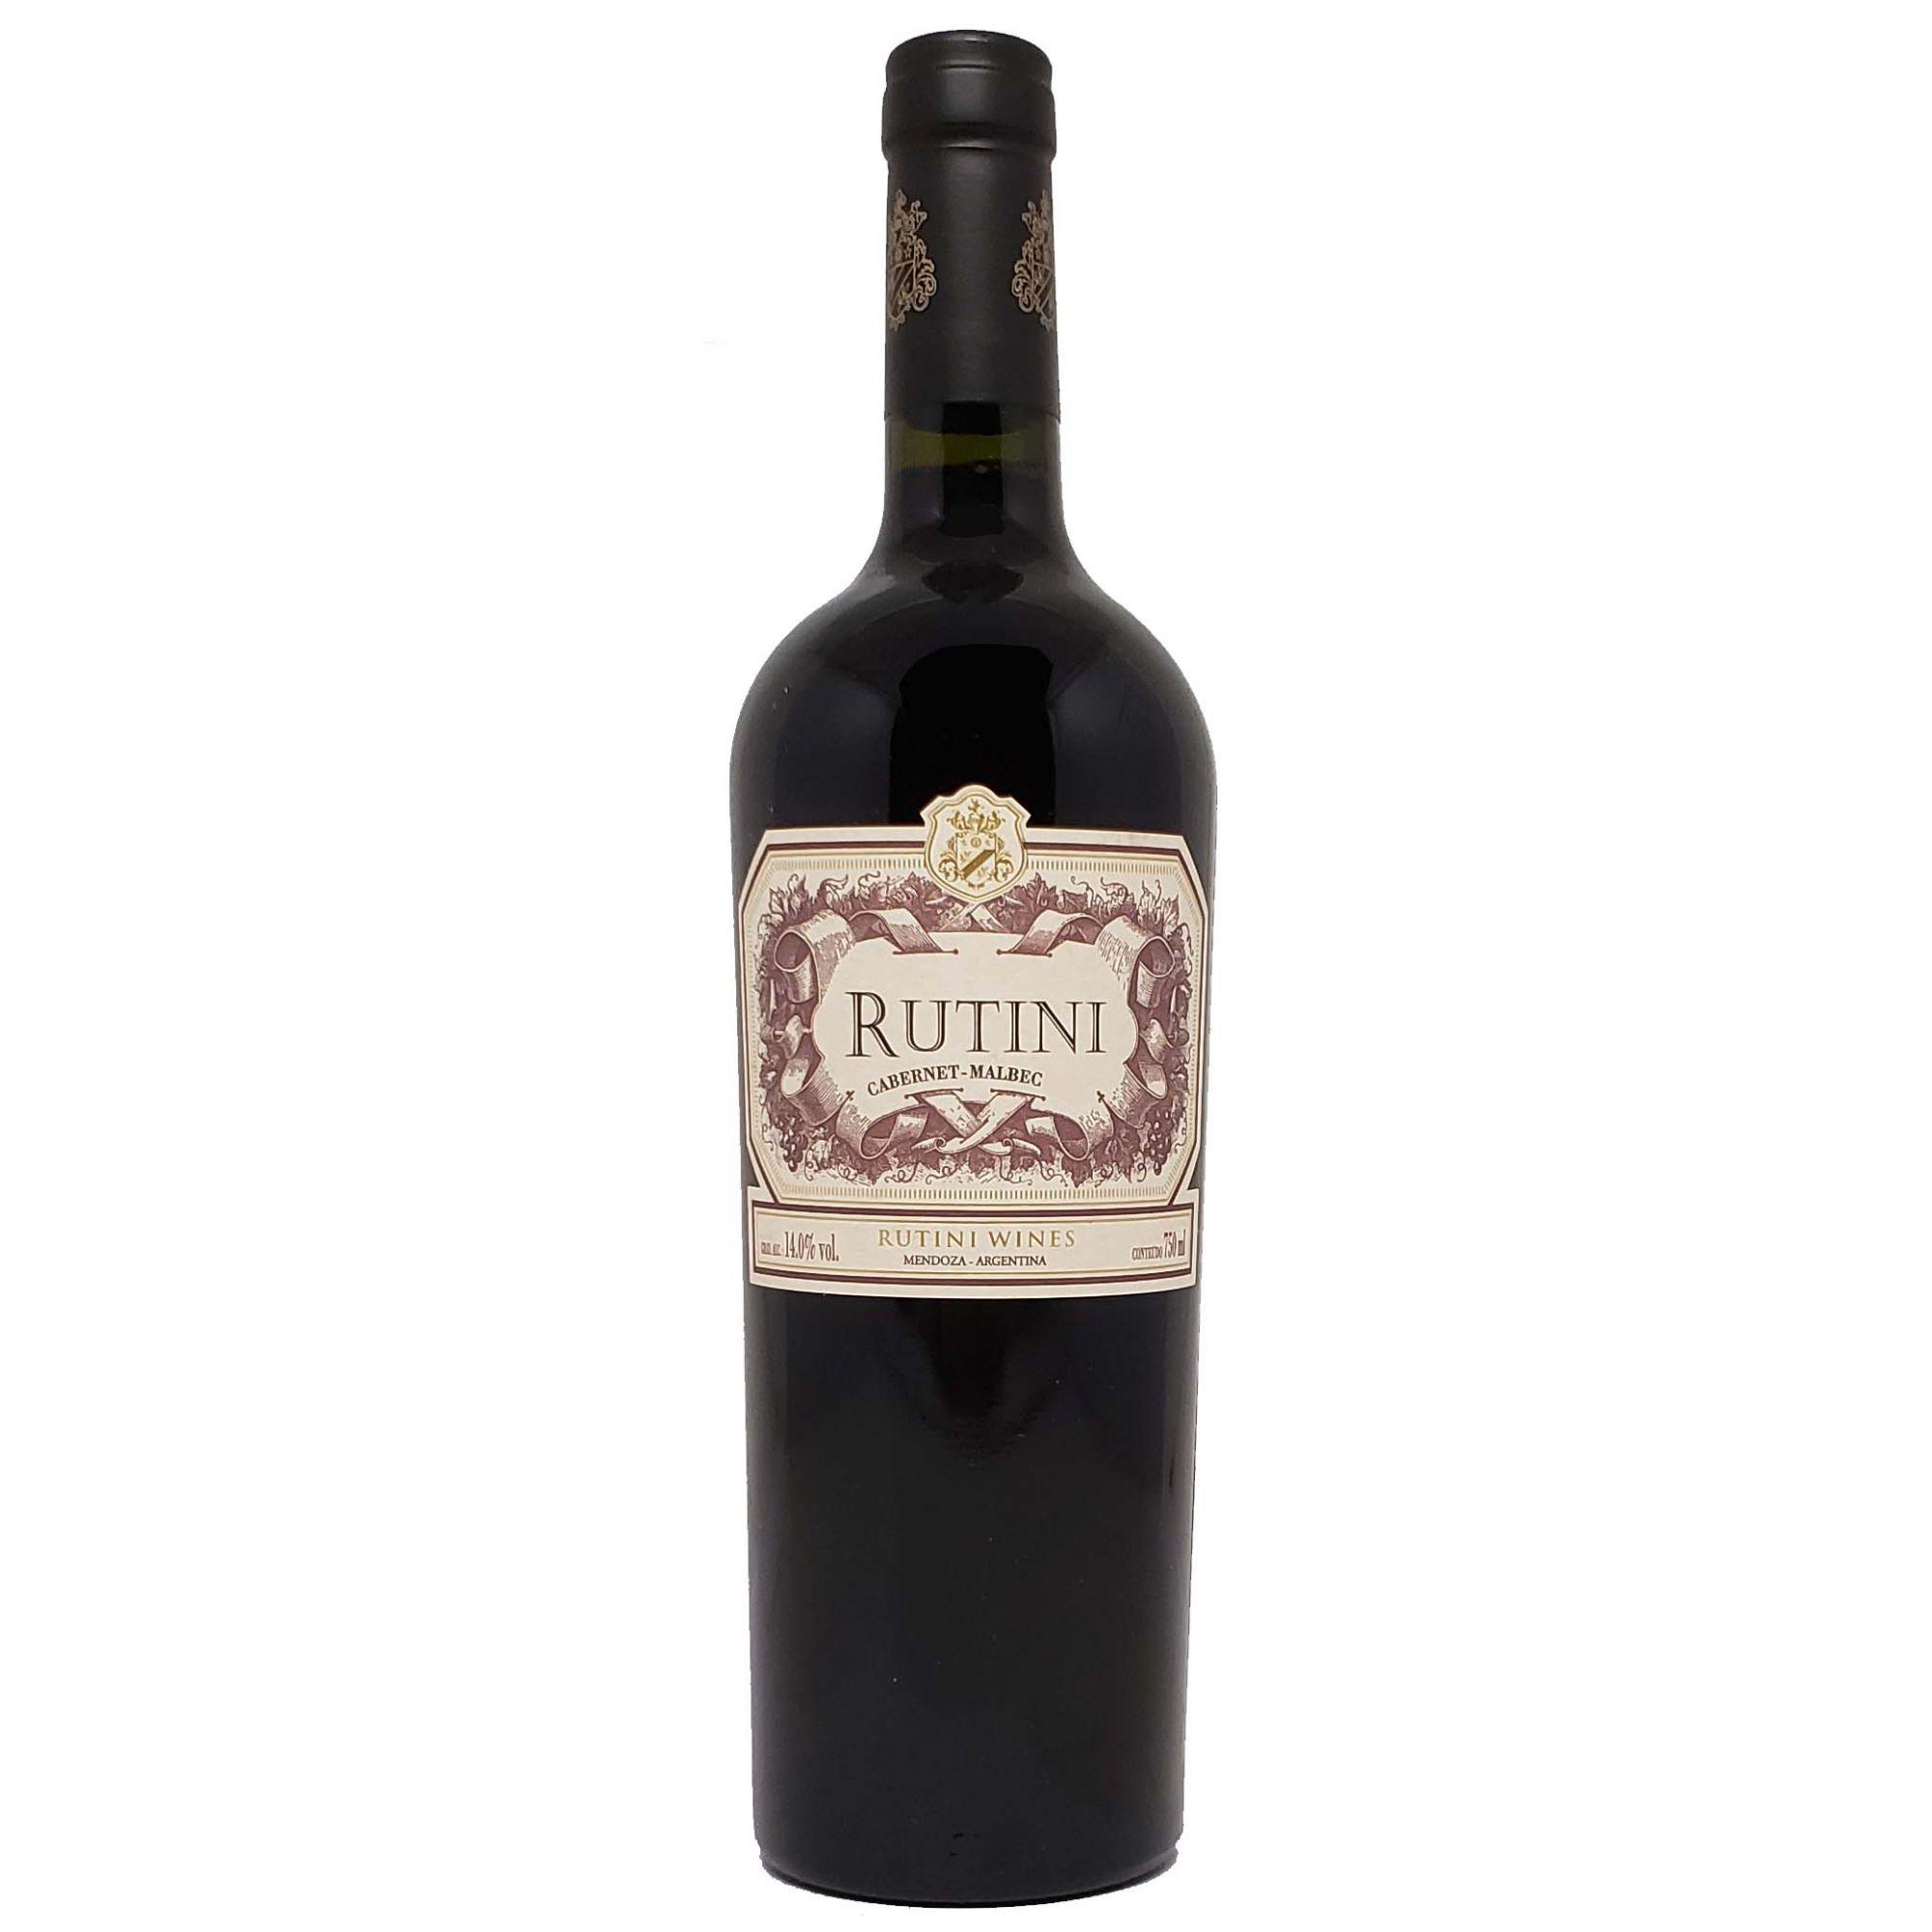 Vinho Tinto Rutini Cabernet Malbec - 750ml -